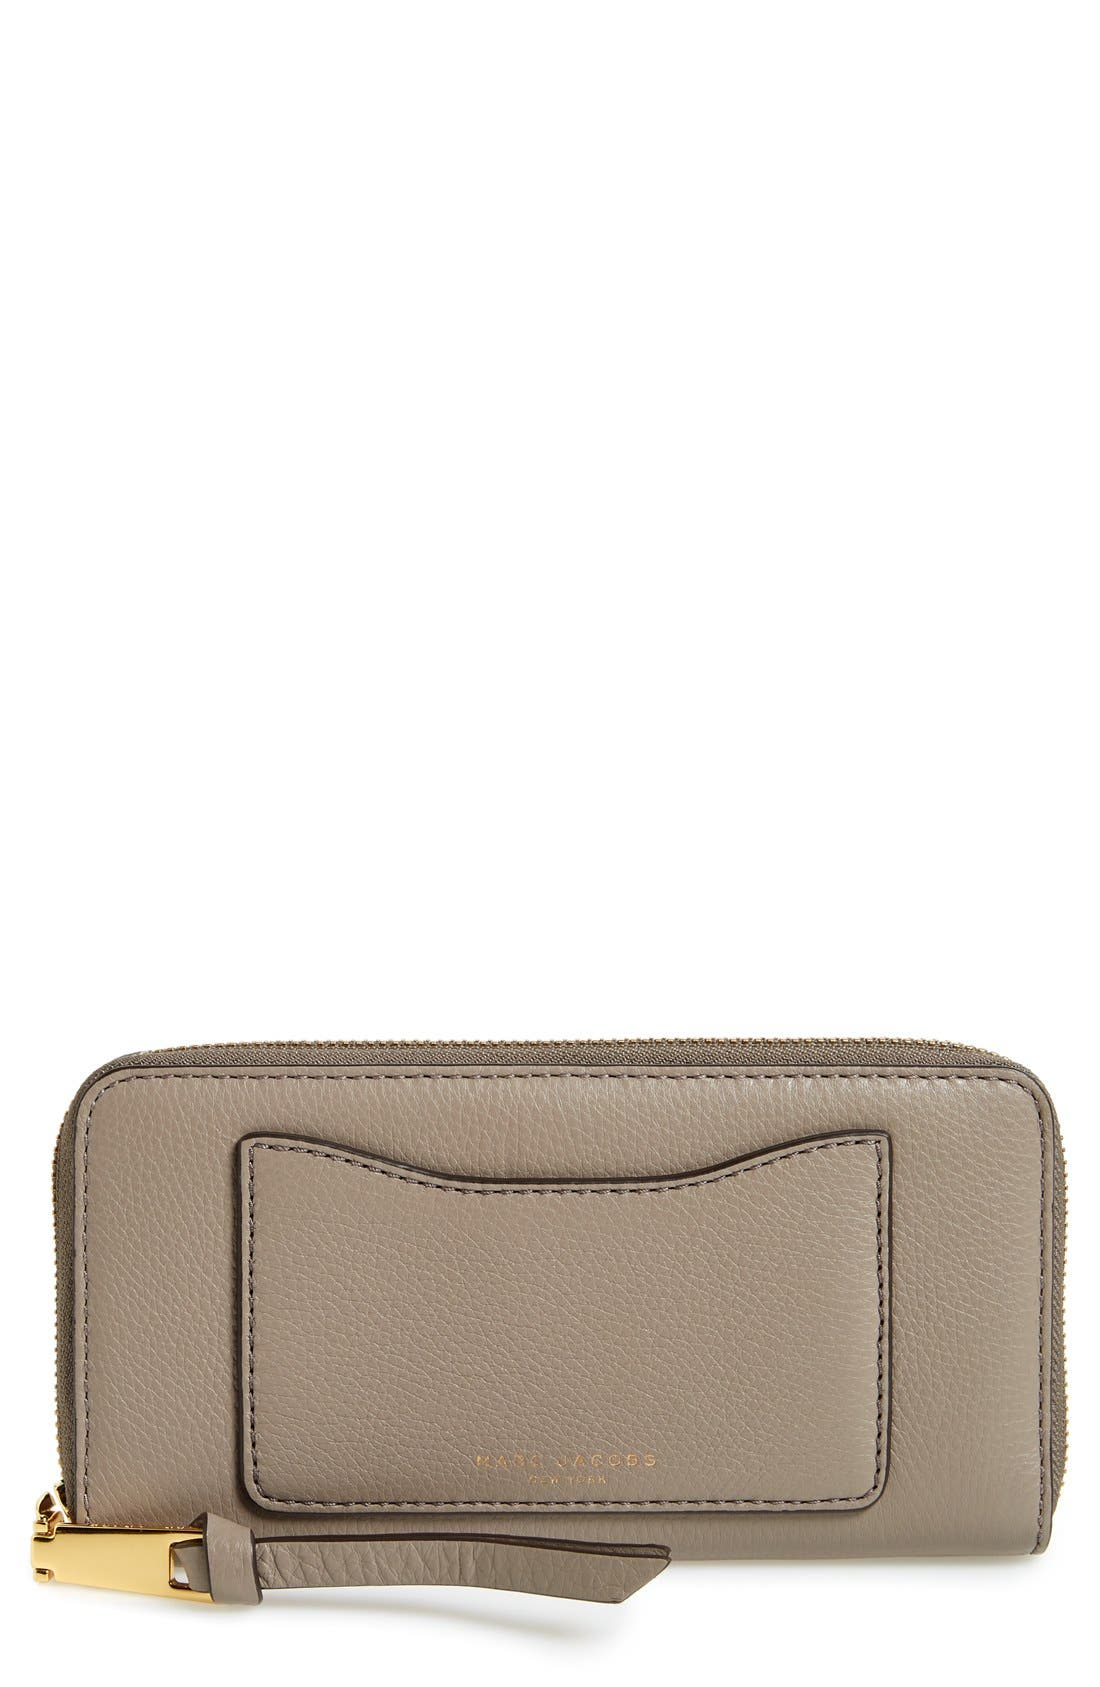 'Recruit Vertical' Leather Wallet,                         Main,                         color, Mink